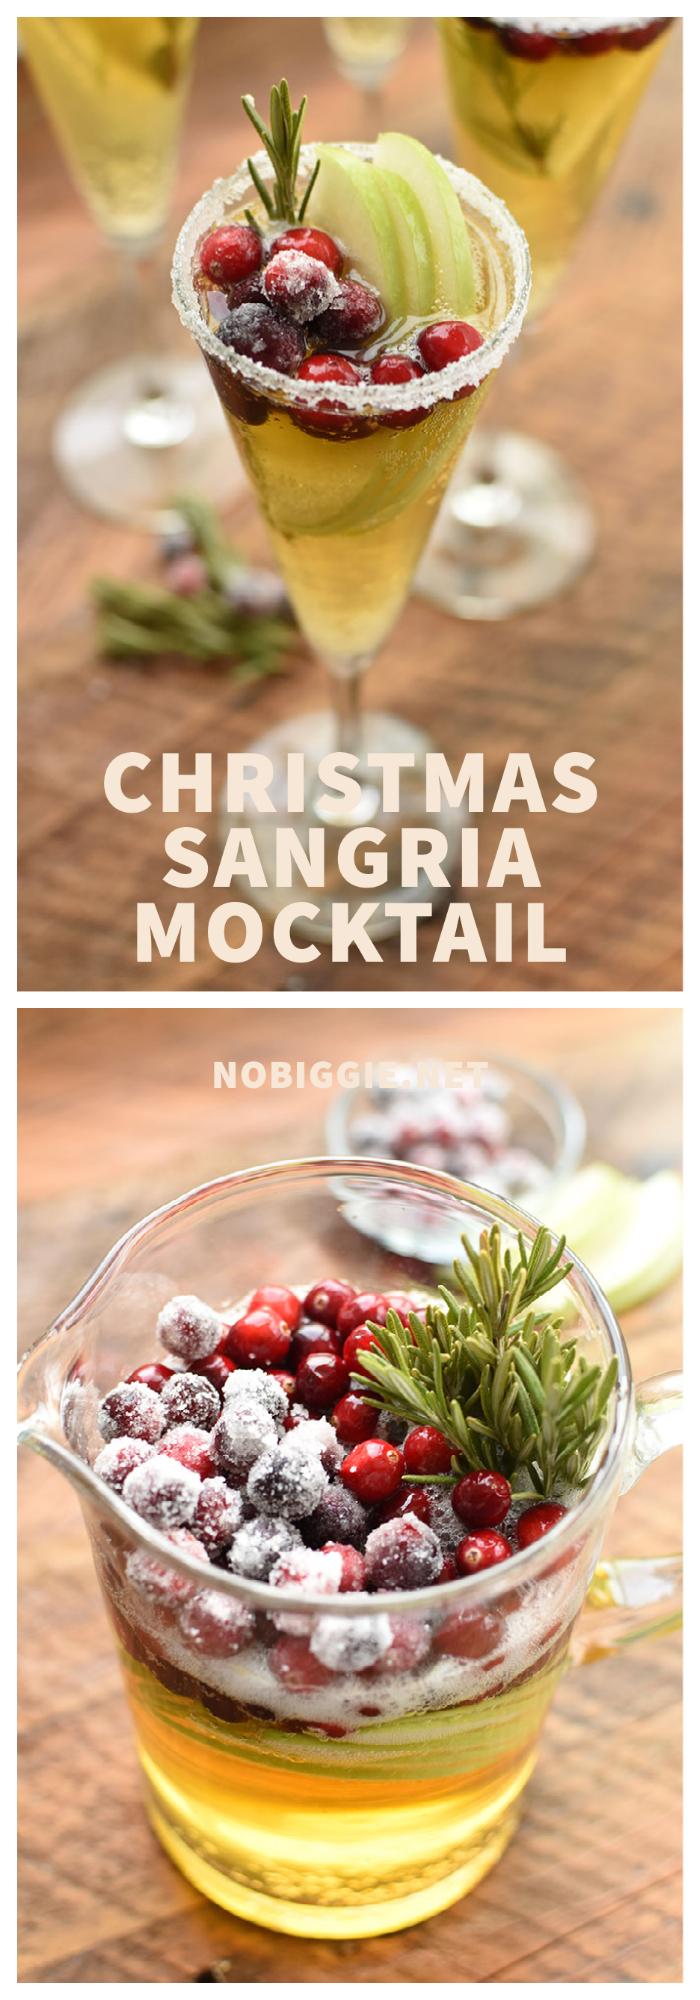 Christmas Sangria Holiday mocktail | NoBiggie.net